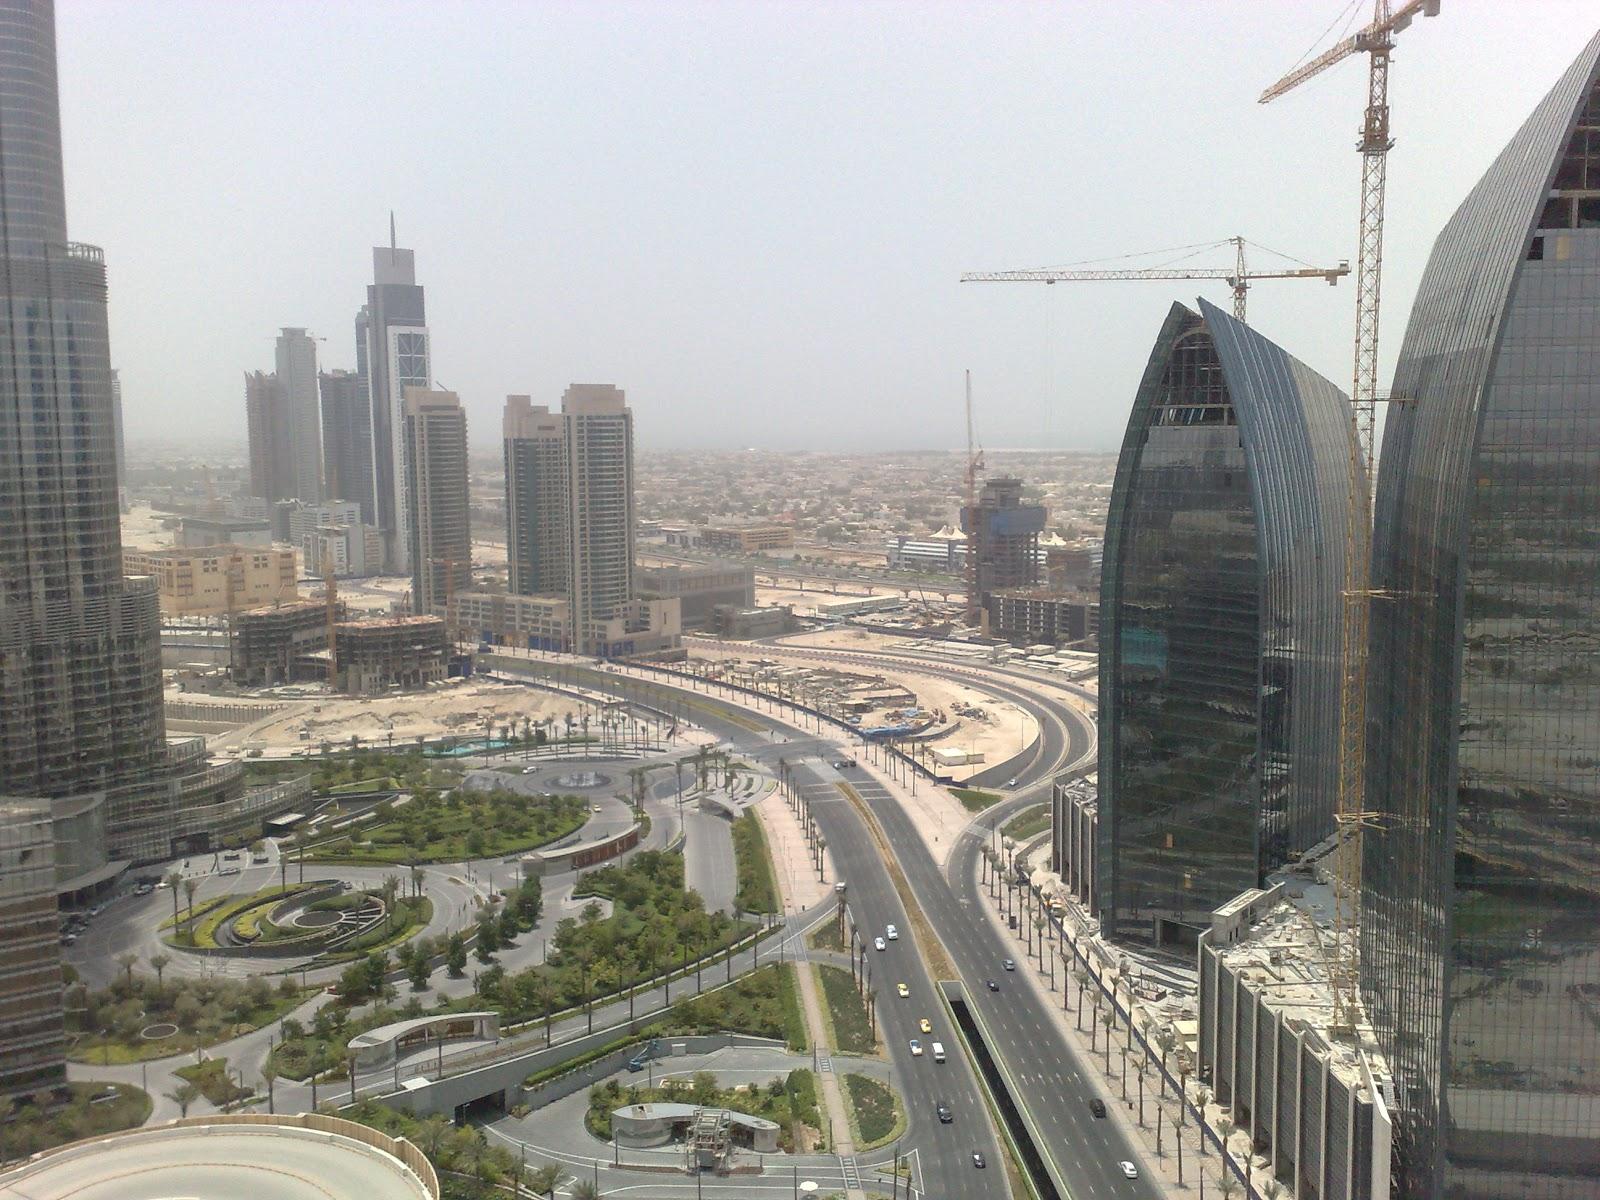 Dubai Freehold Property Law